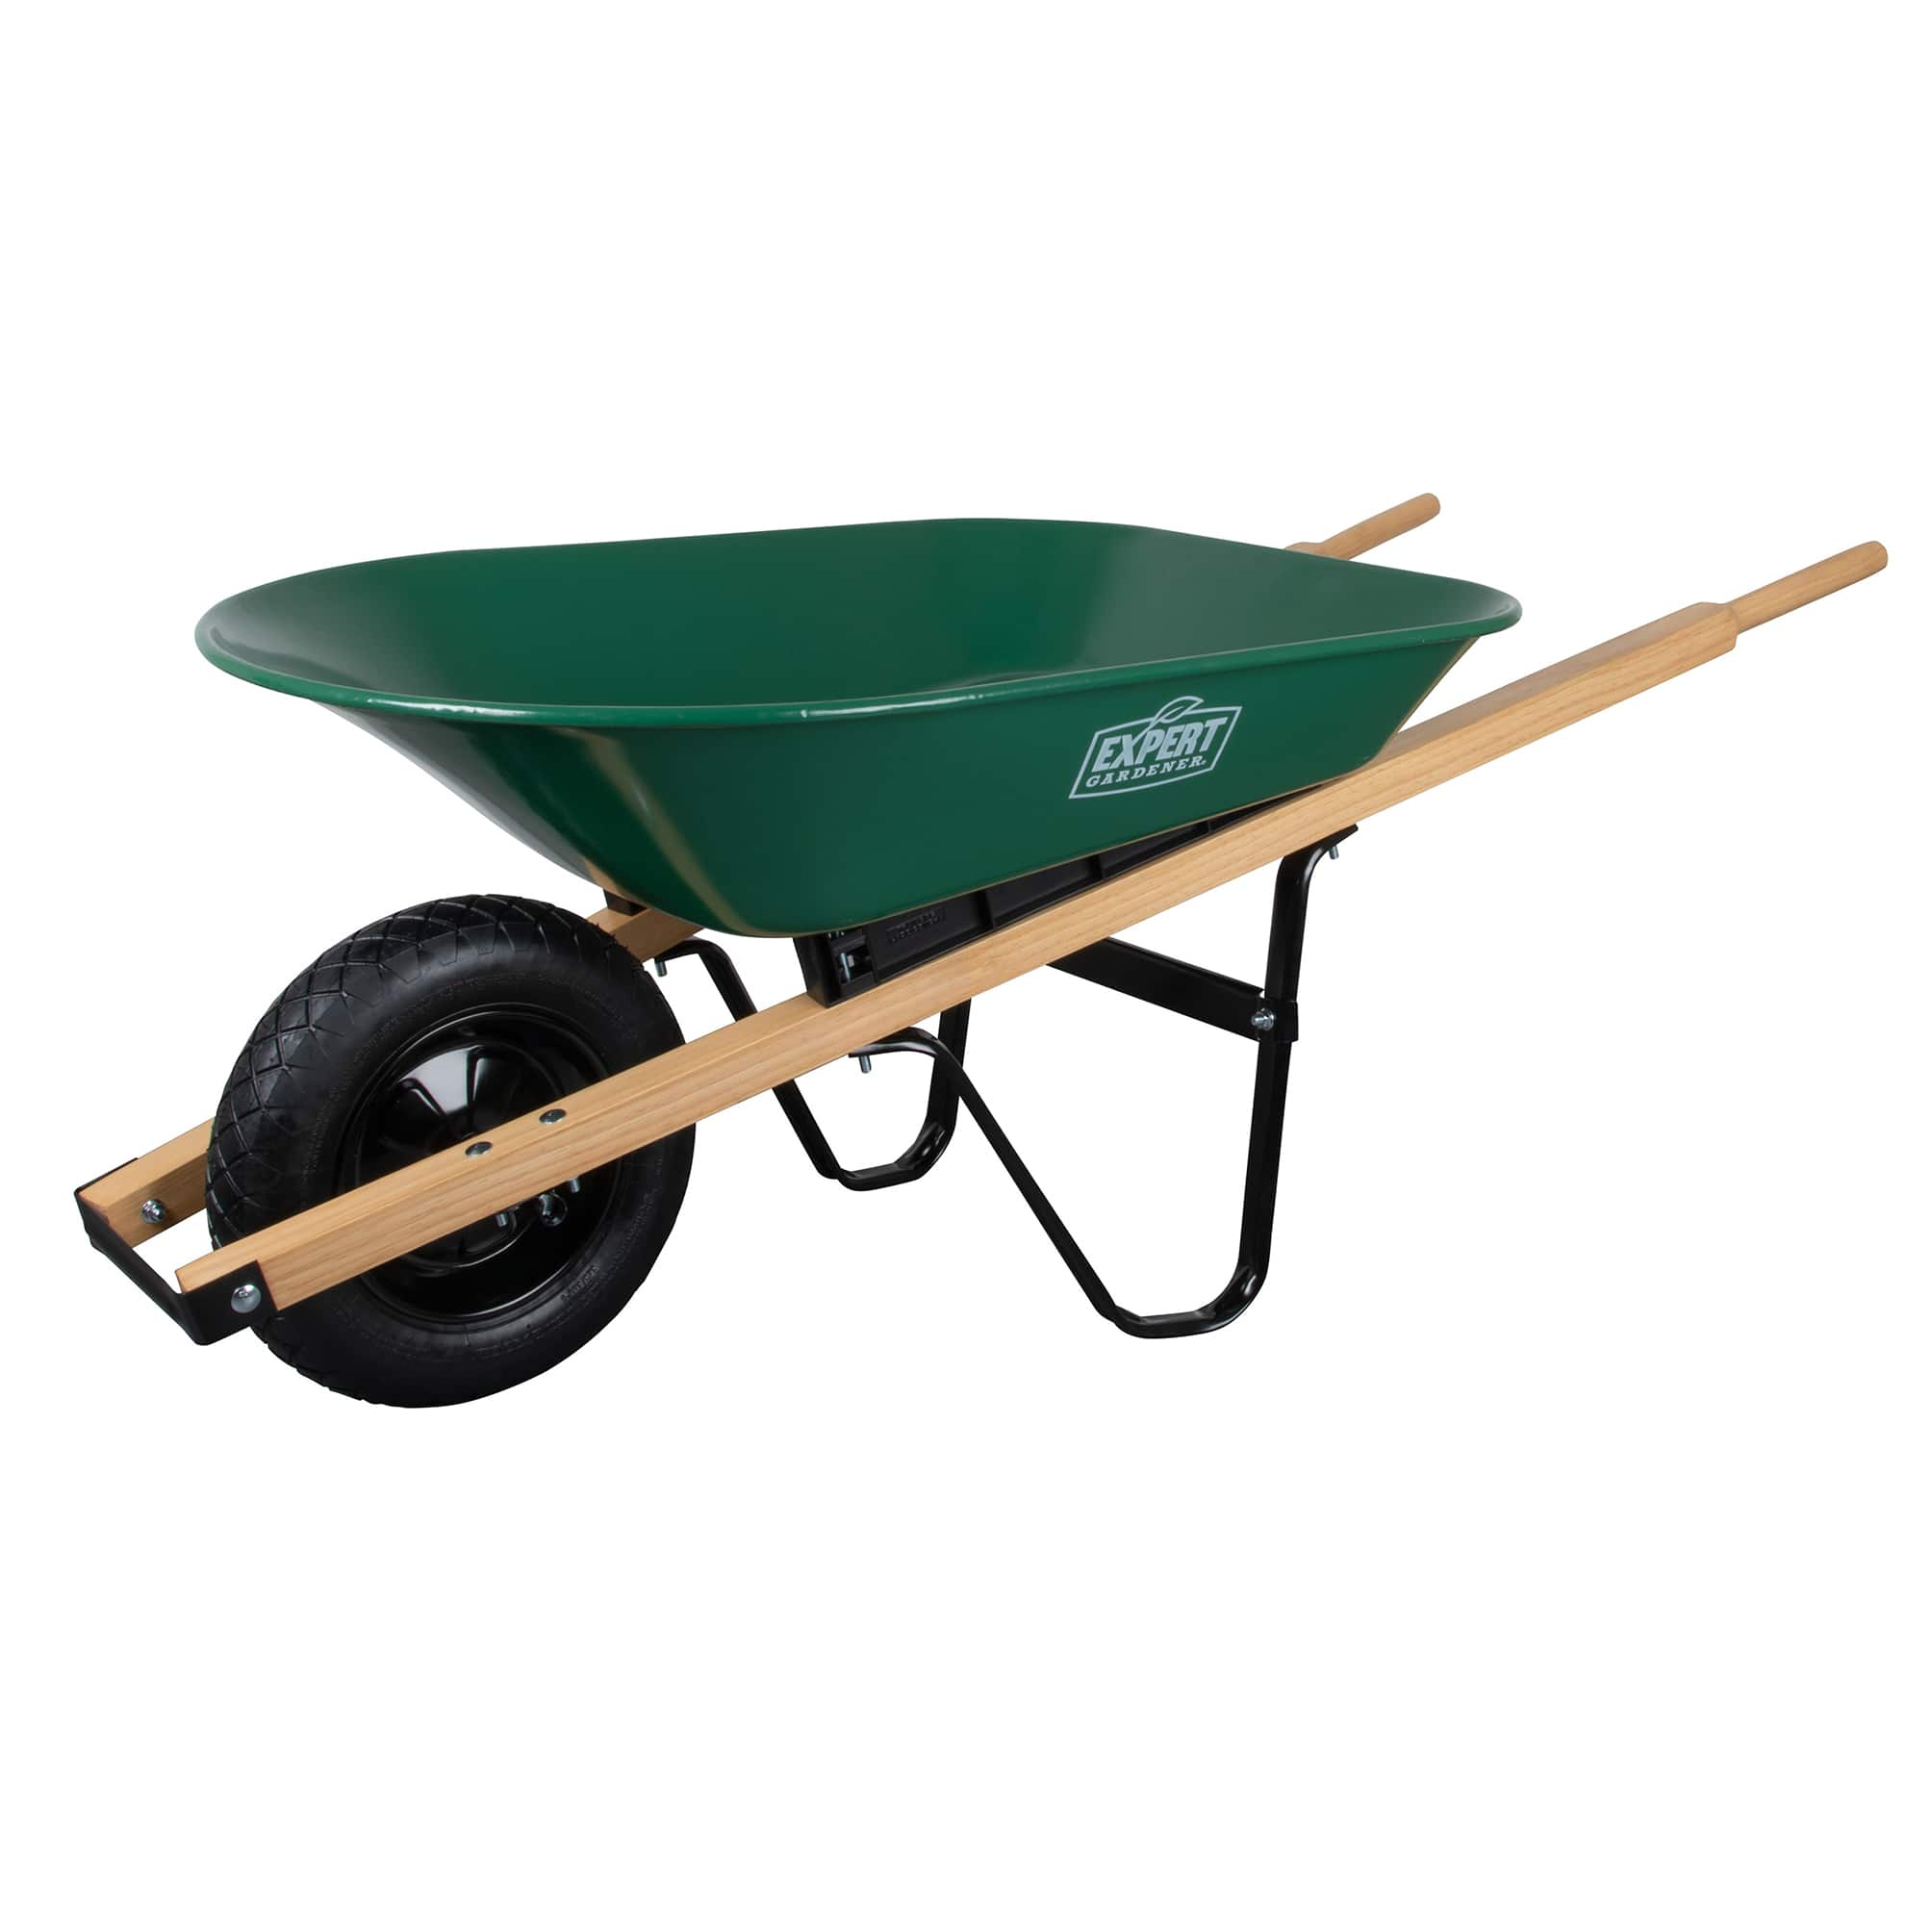 $9 wheelbarrow walmart - Expert Gardener Steel Wheelbarrow, 4 Cu. Ft.